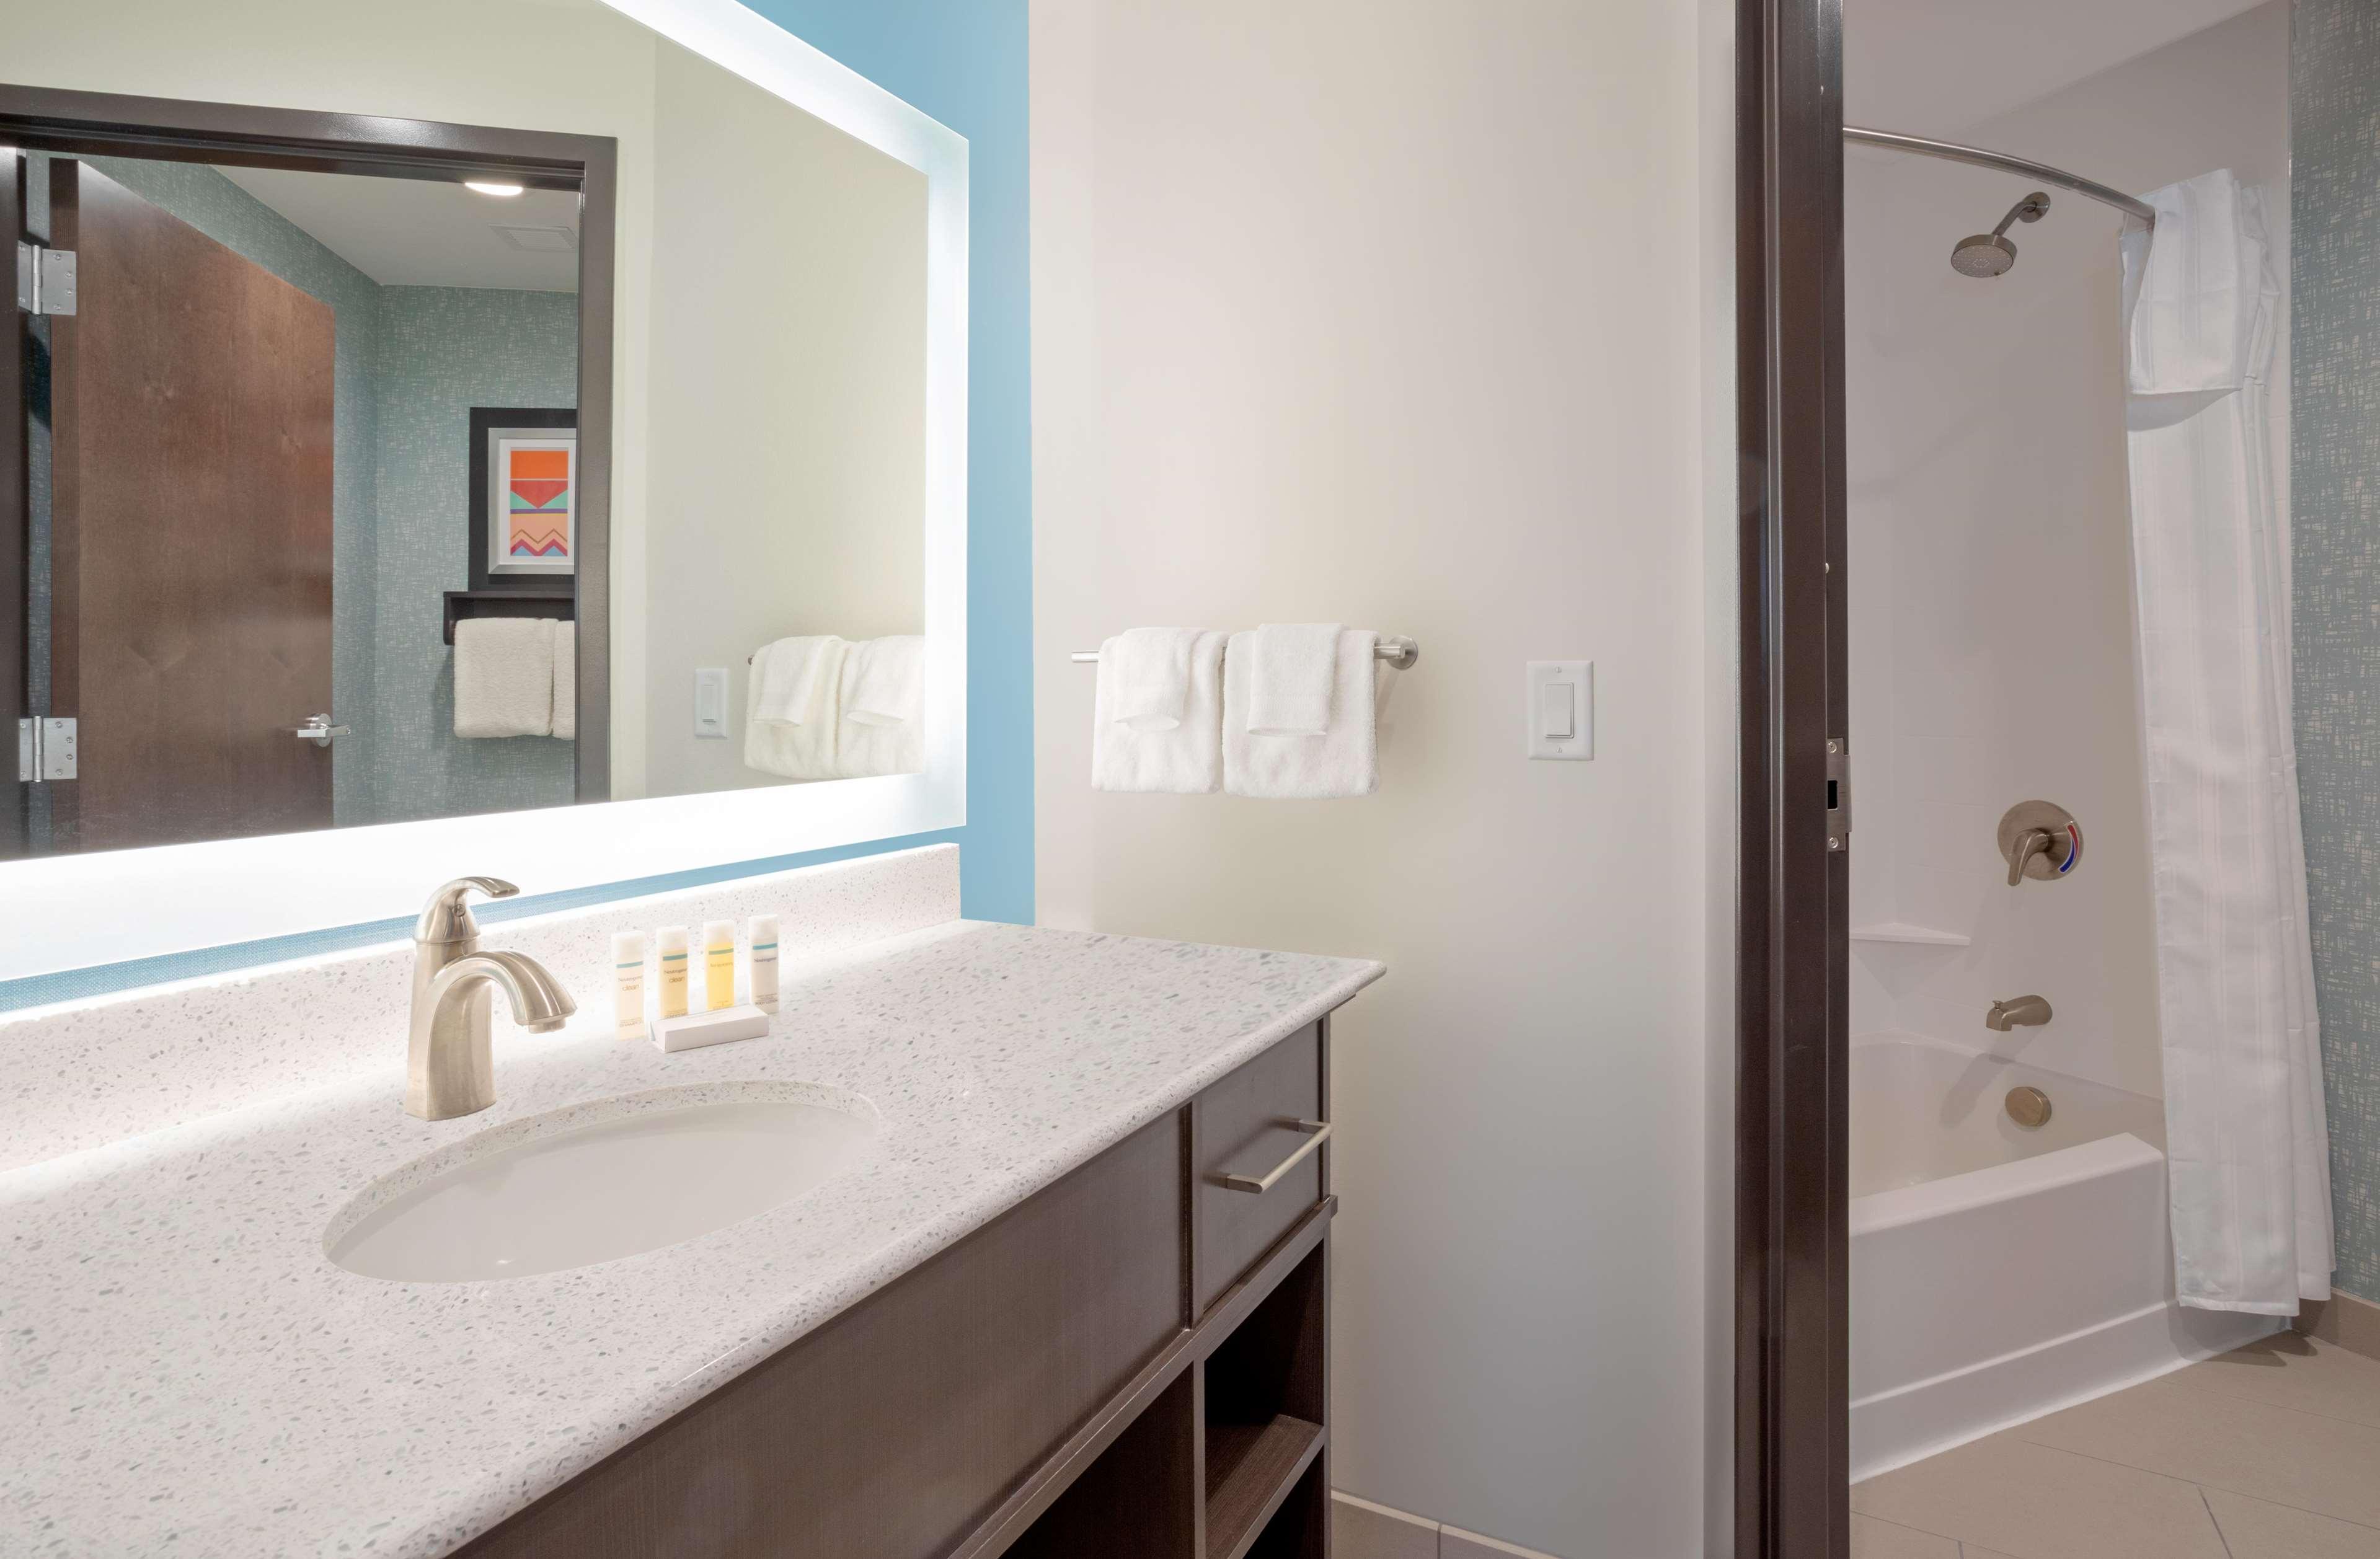 Homewood Suites by Hilton Edina Minneapolis image 16